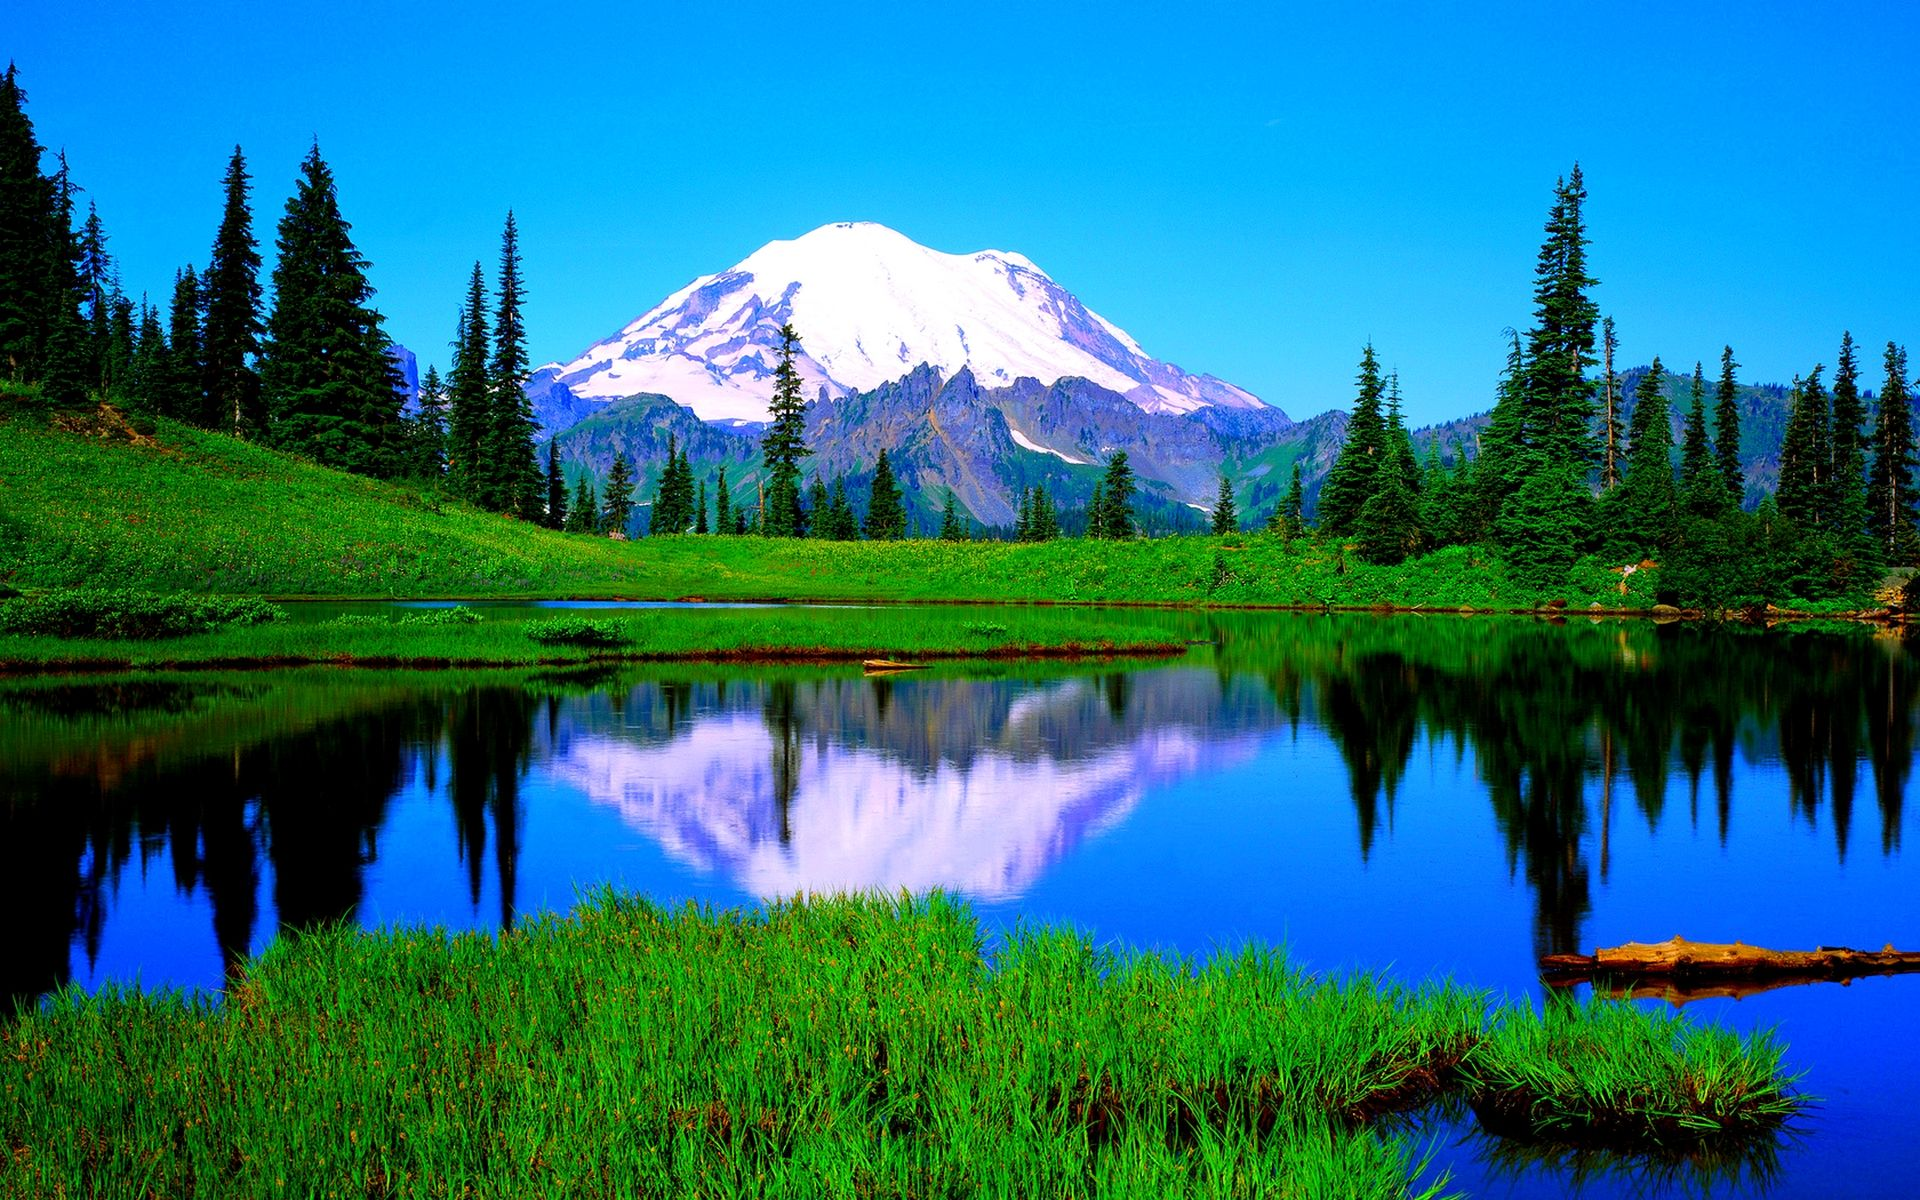 Calm Lake Desktop Background Wallpapers Hd Free 514894 Rainier National Park Mount Rainier National Parks